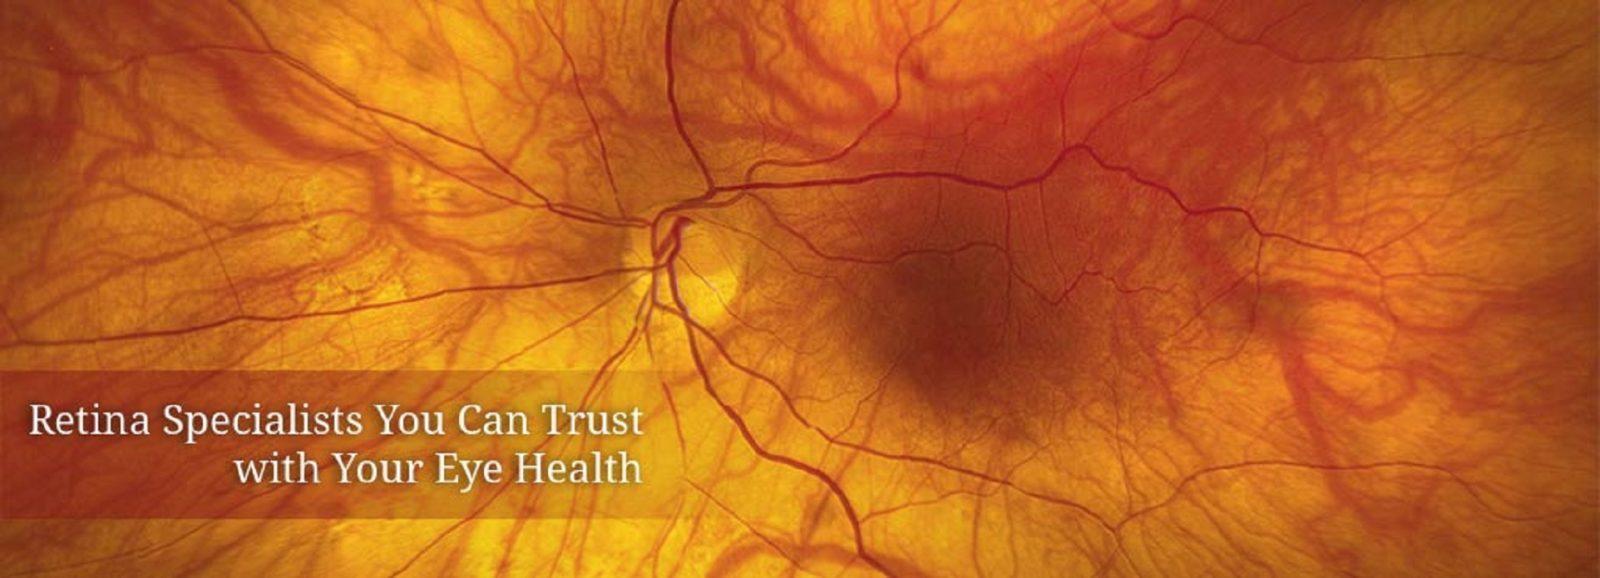 retina vitreous lasik eye center